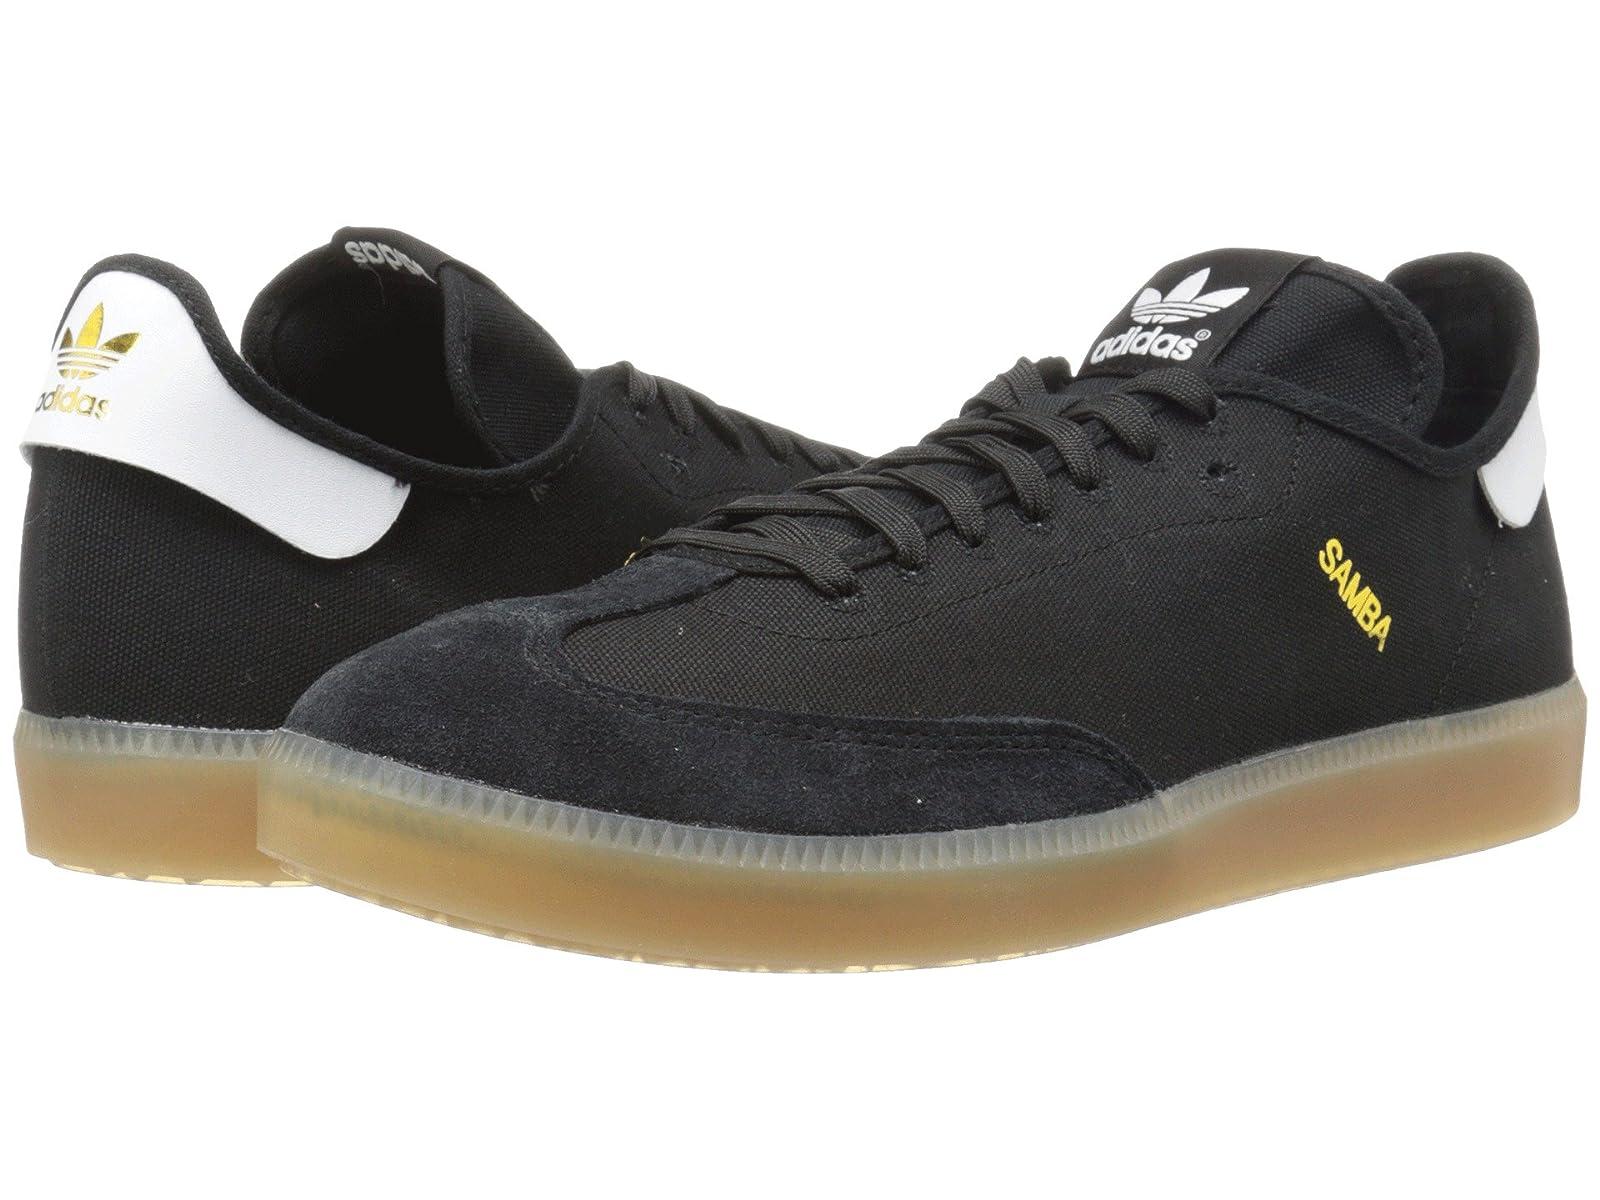 adidas Originals Samba MCAtmospheric grades have affordable shoes